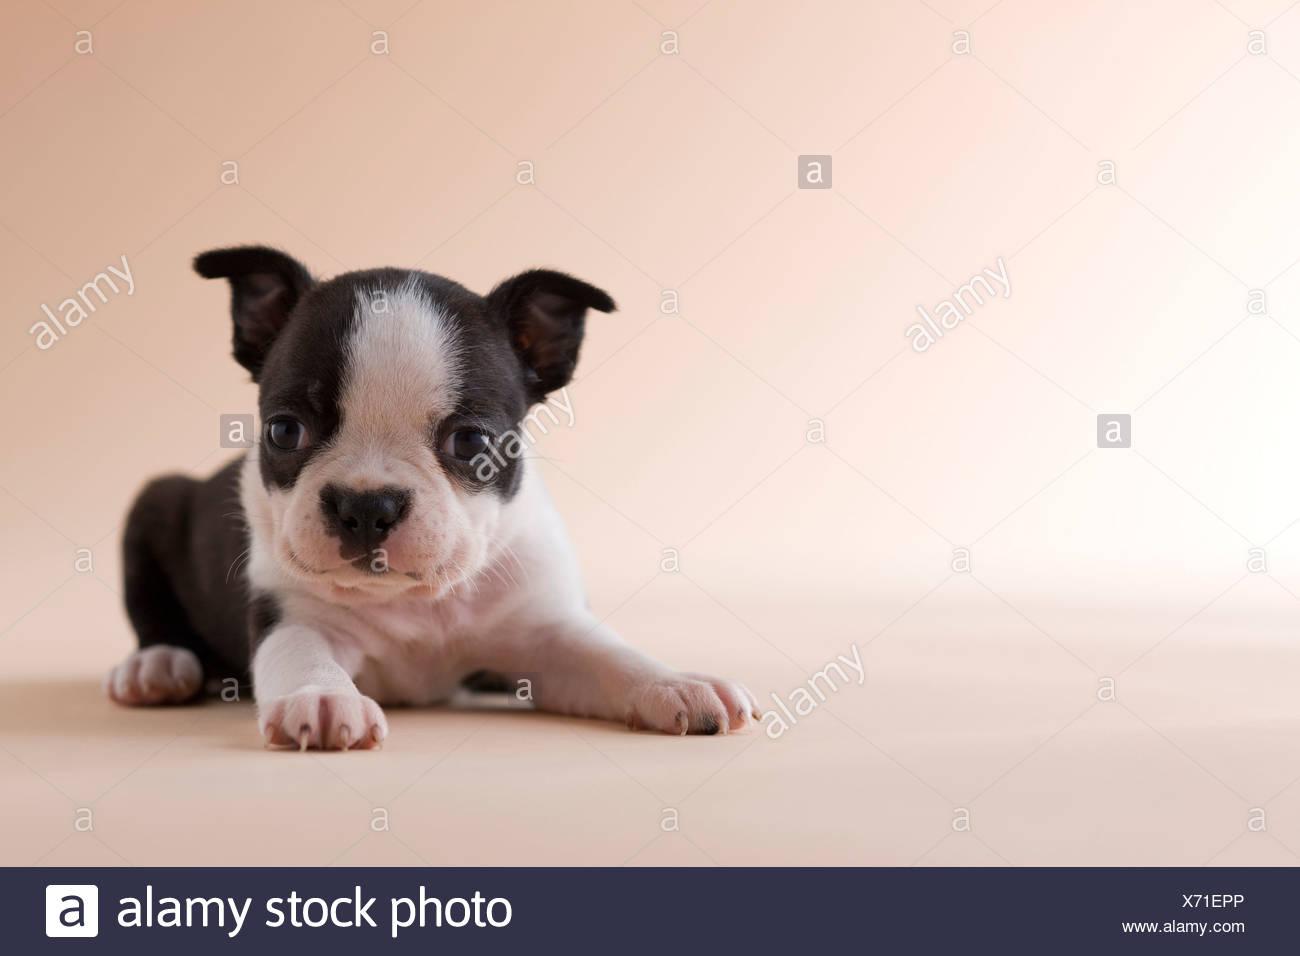 Boston Terrier Puppy - Stock Image